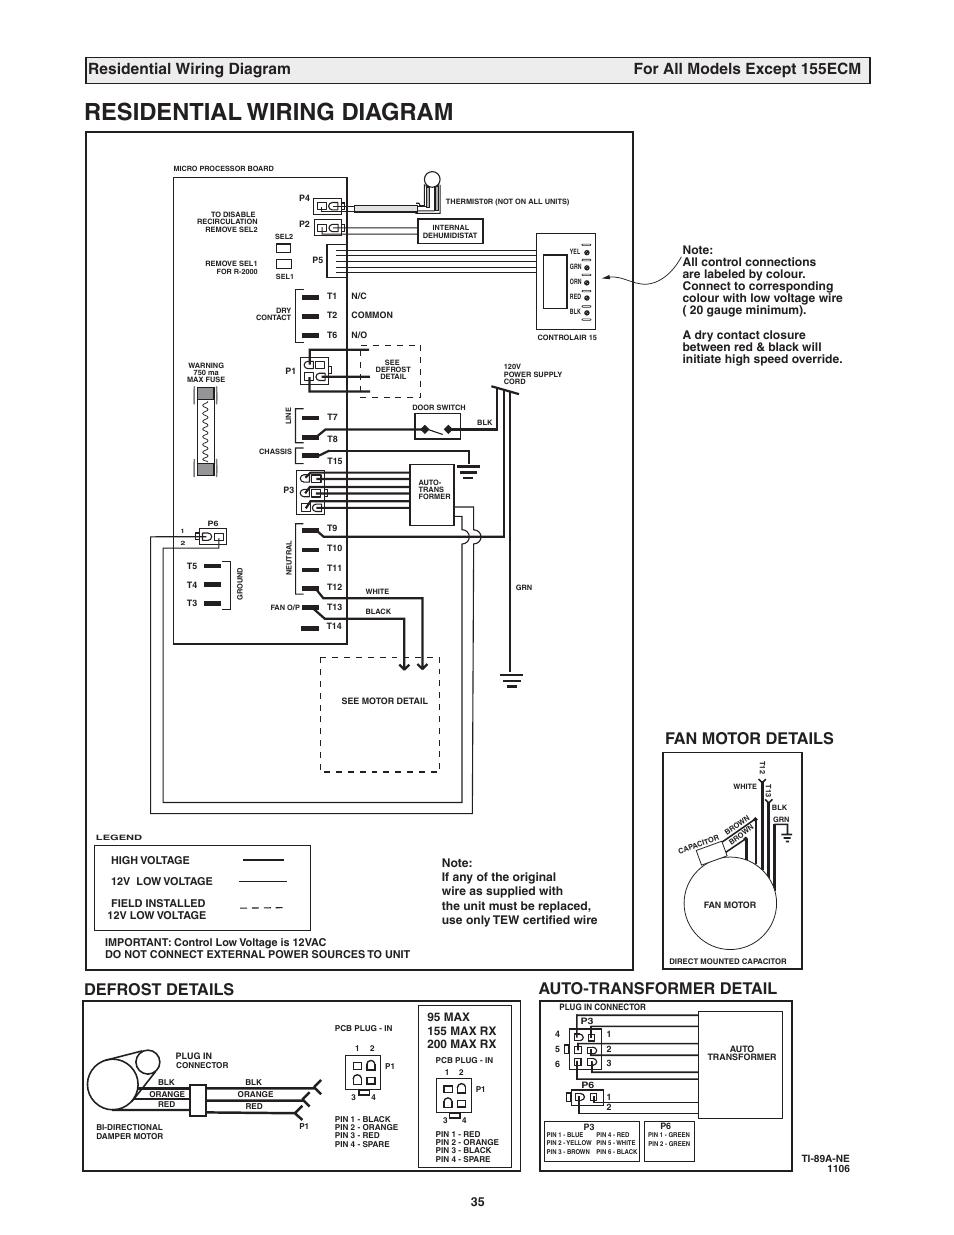 medium resolution of residential wiring diagram fan motor details auto transformer detail defrost details